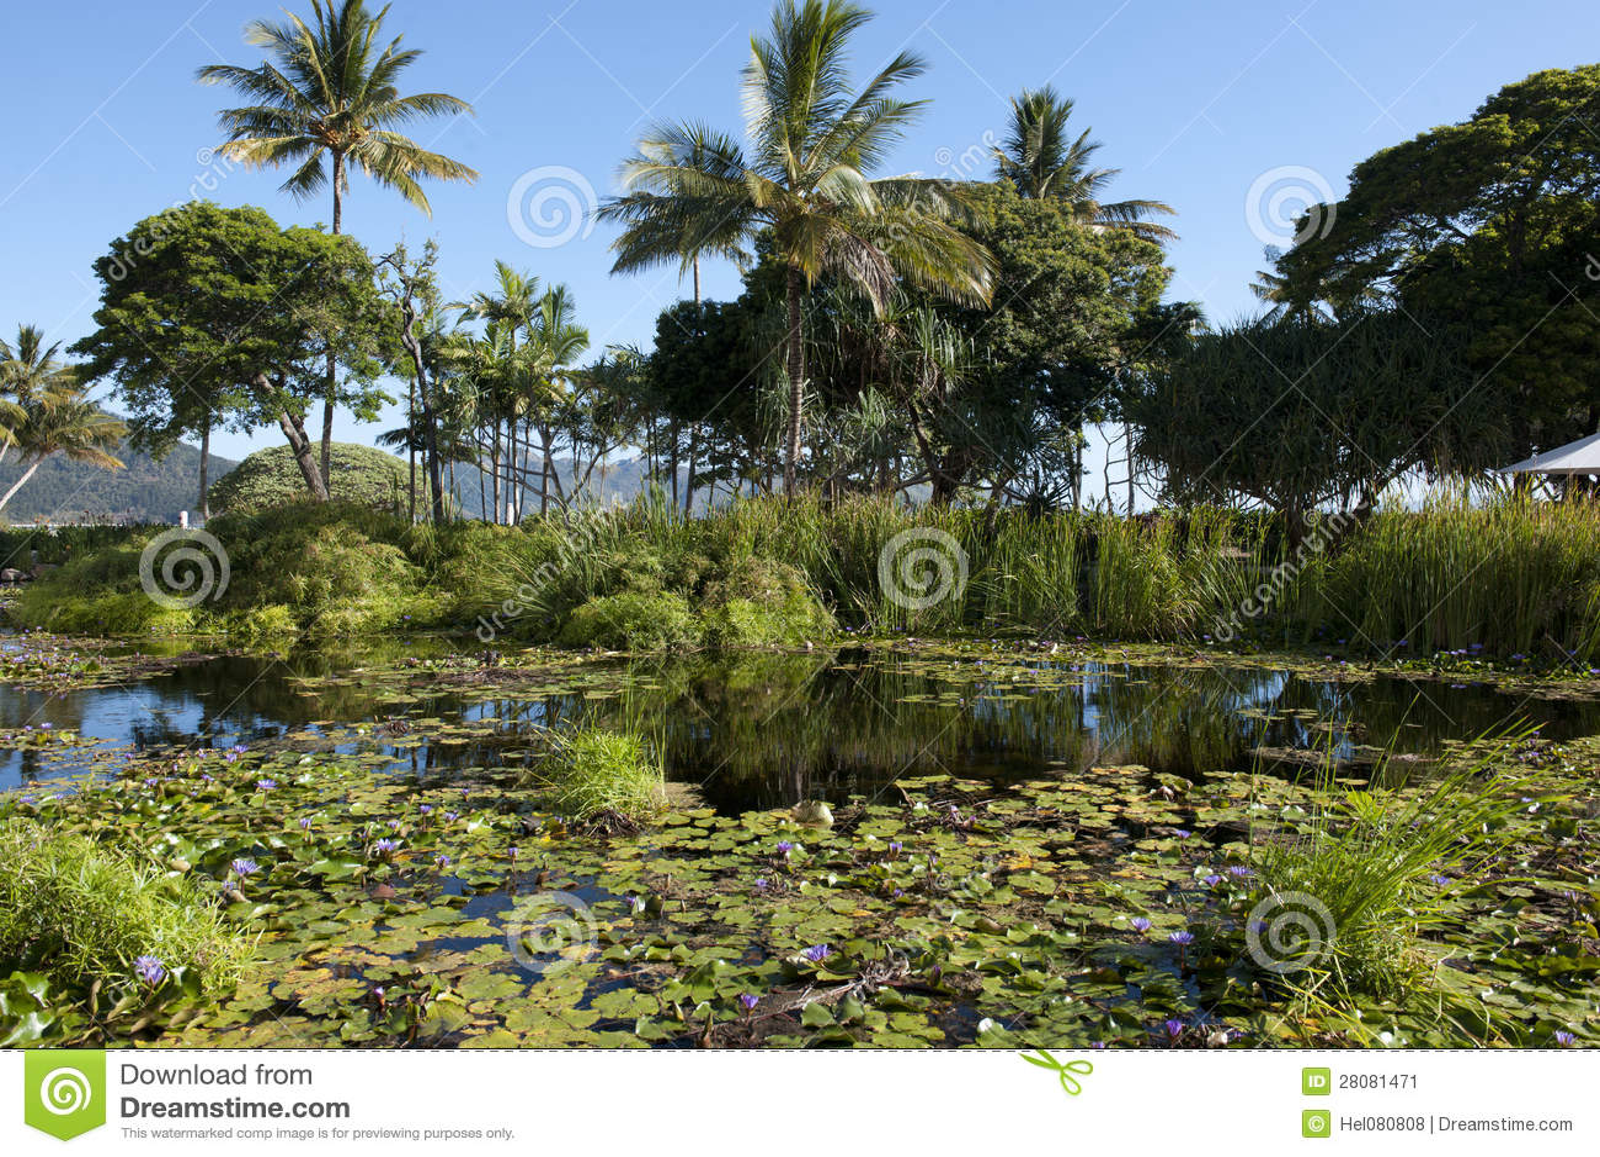 Hayman Island stock image  Image of bloom, landscape - 28081471